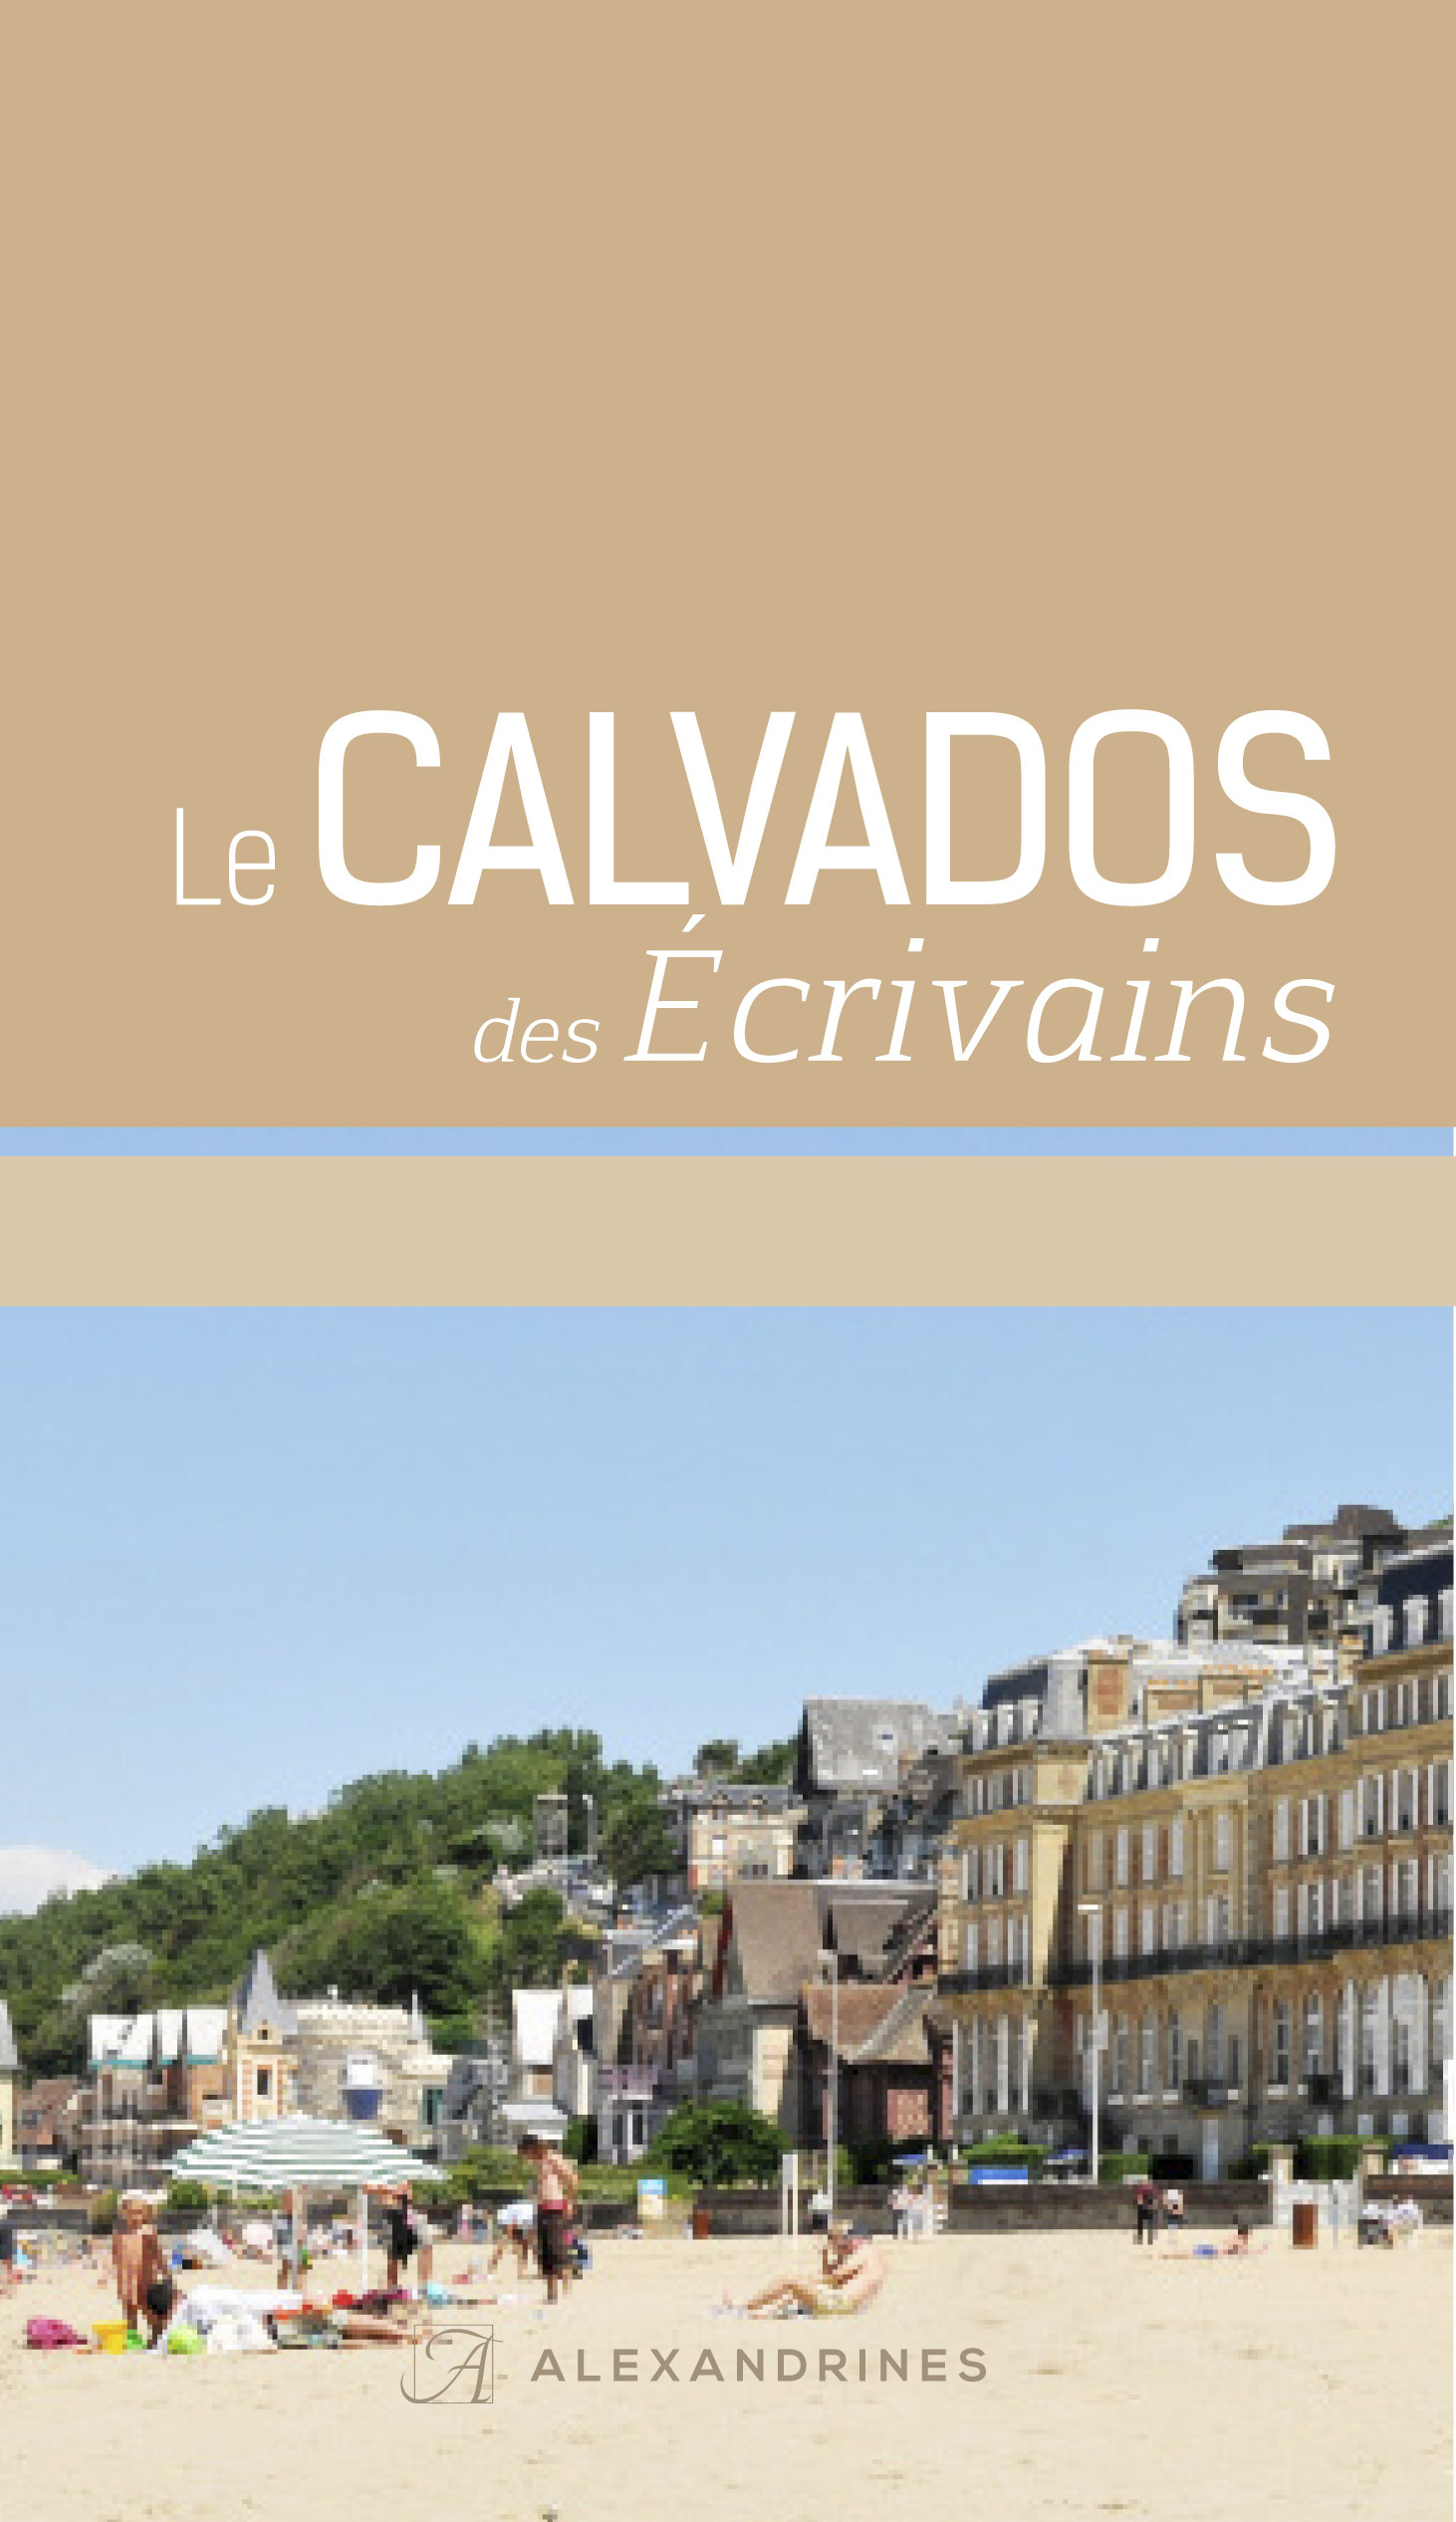 CALVADOS DES ECRIVAINS (LE)